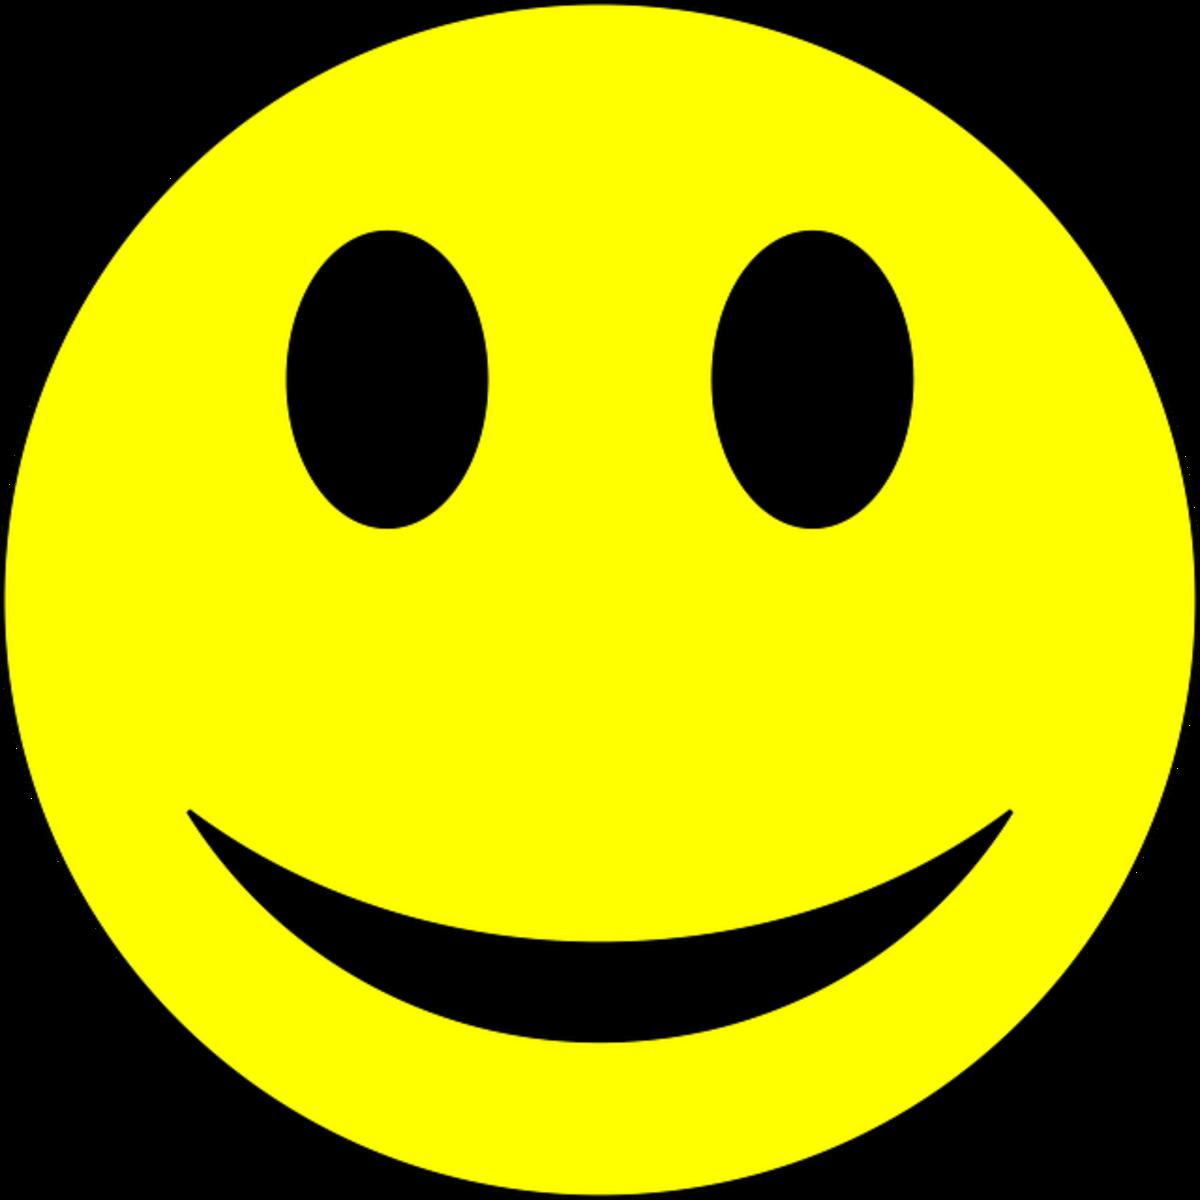 shameless-smiley-face-emoticon-abuse